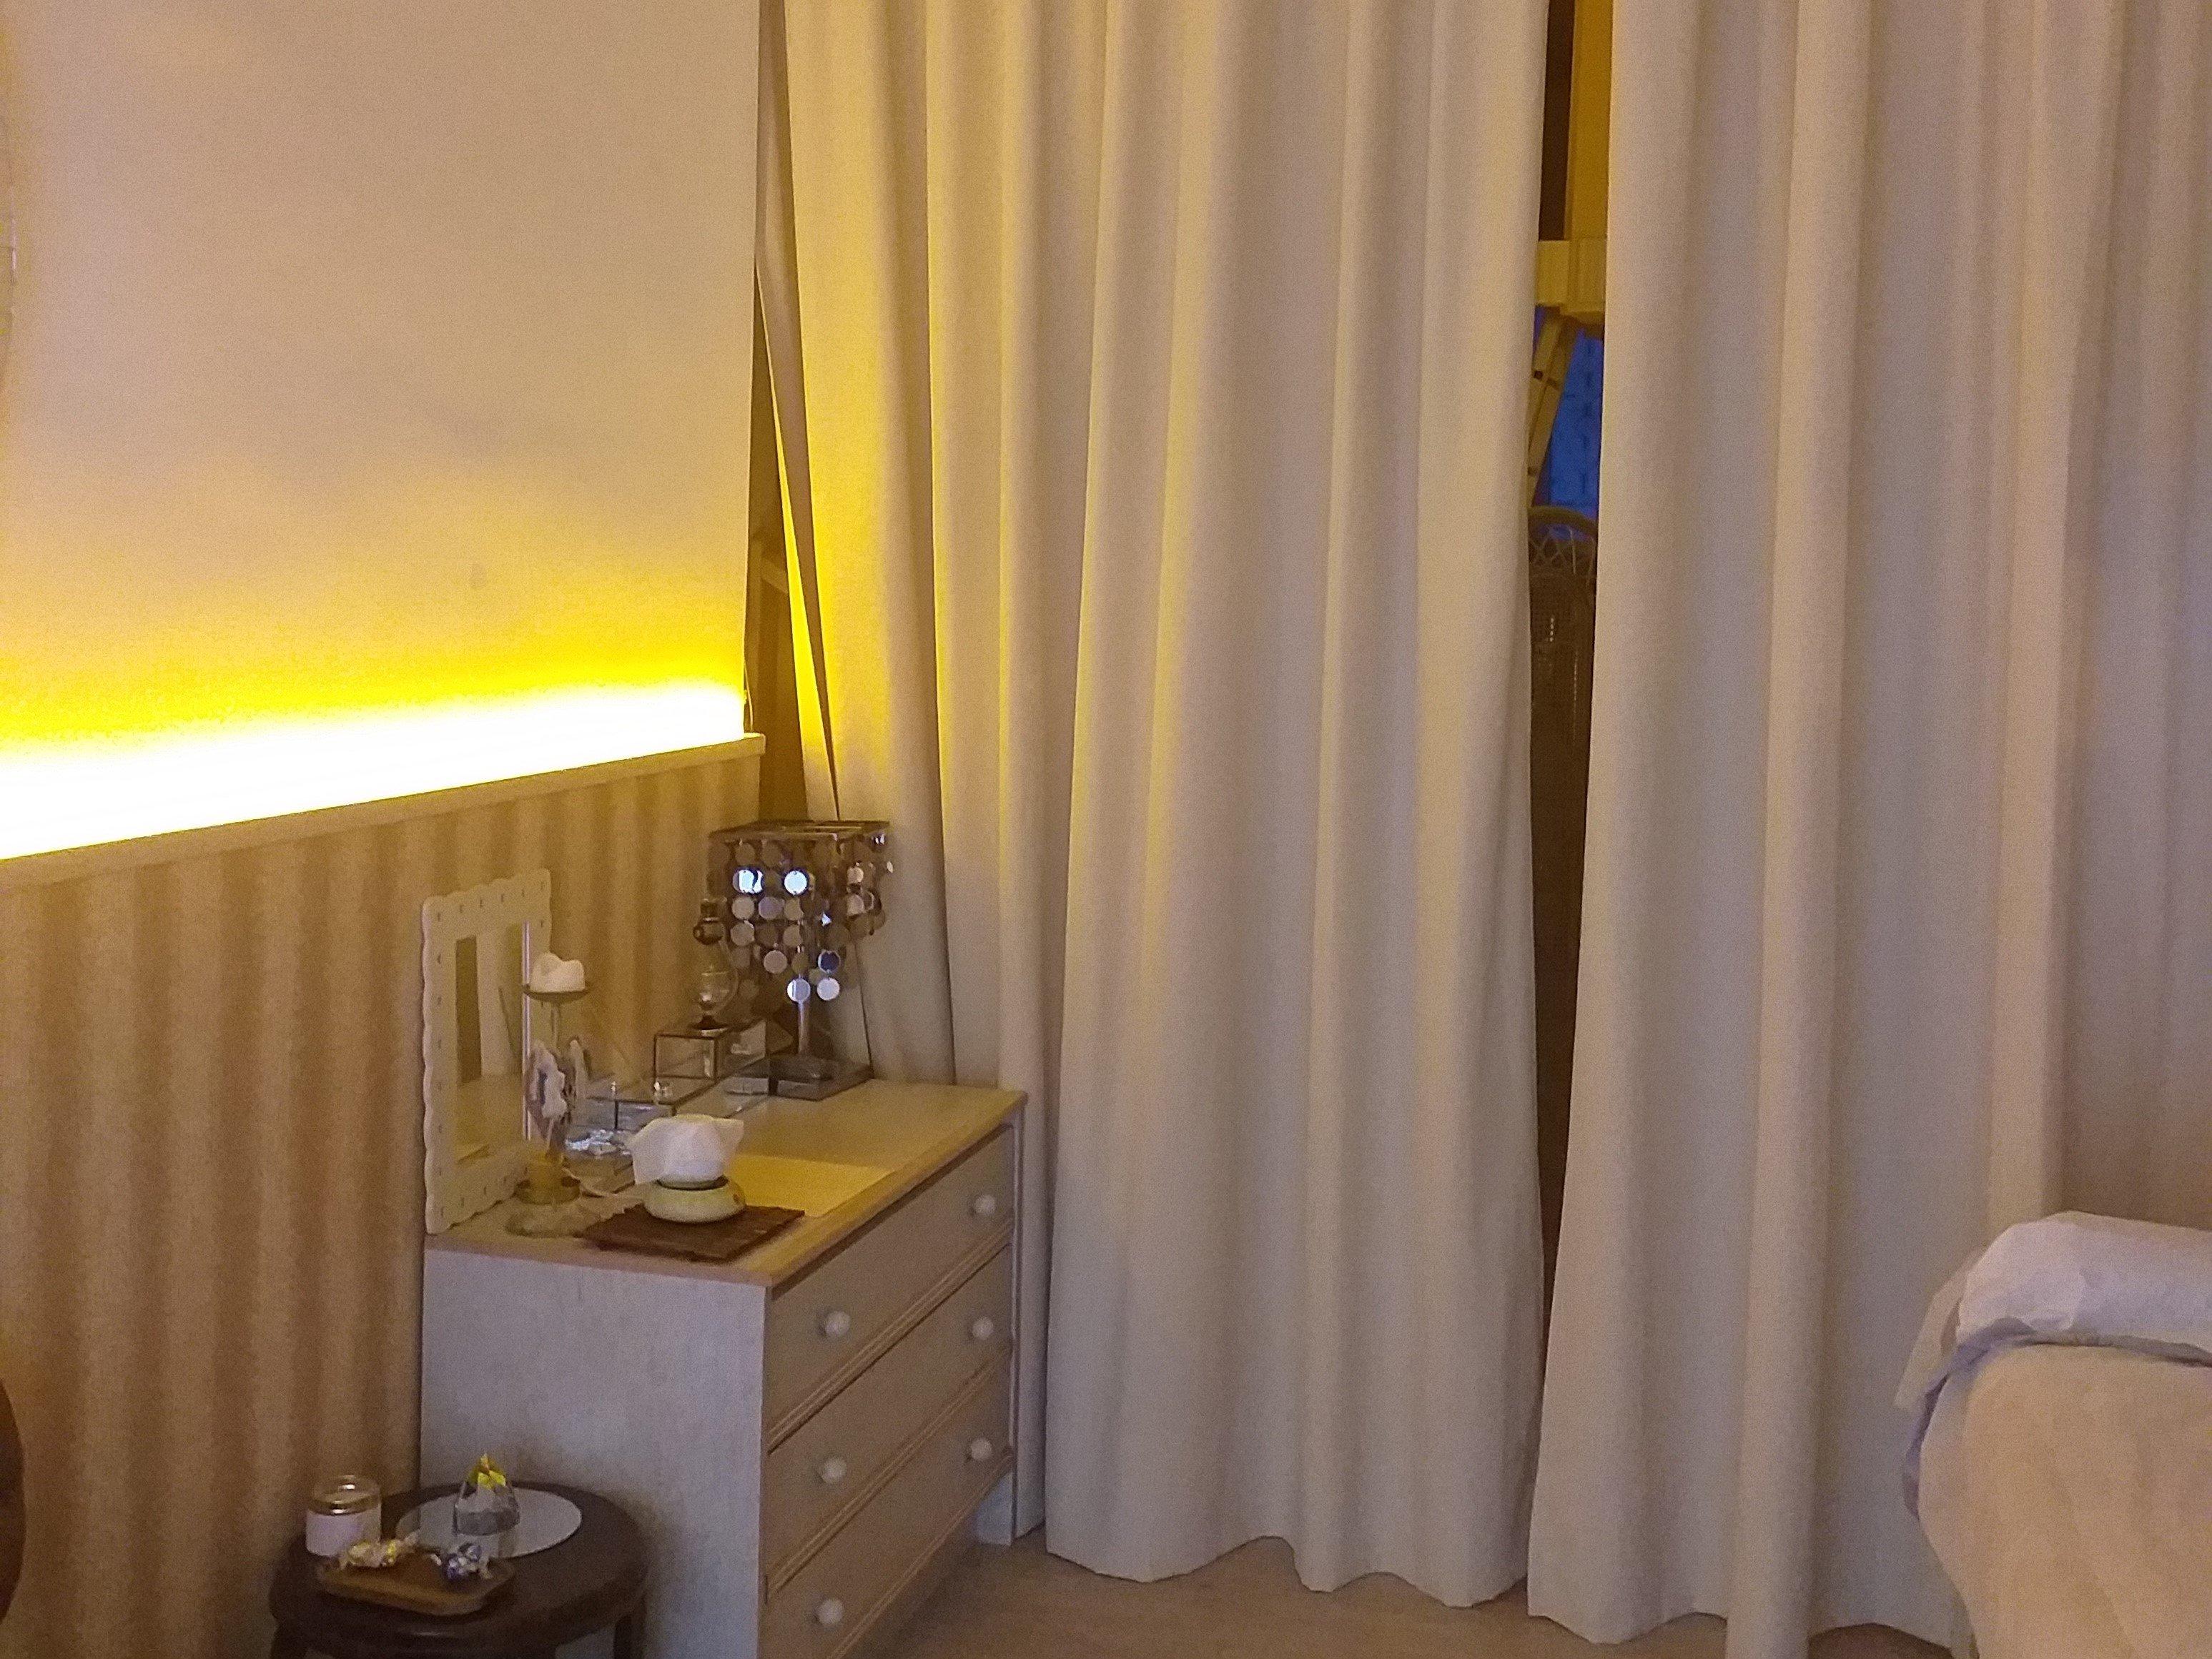 Sala con cortinas